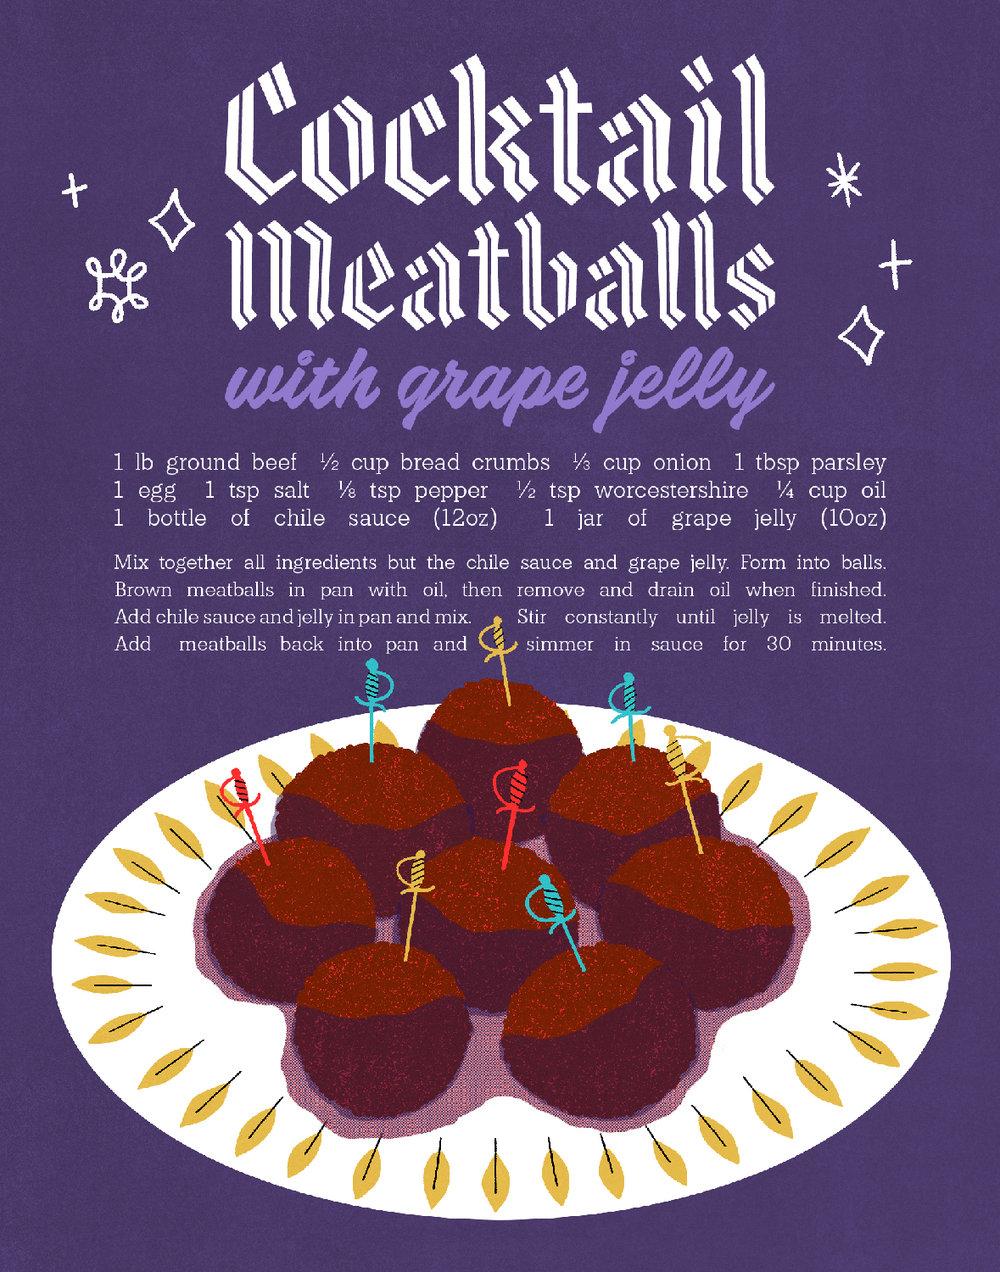 meatballs-02.jpg